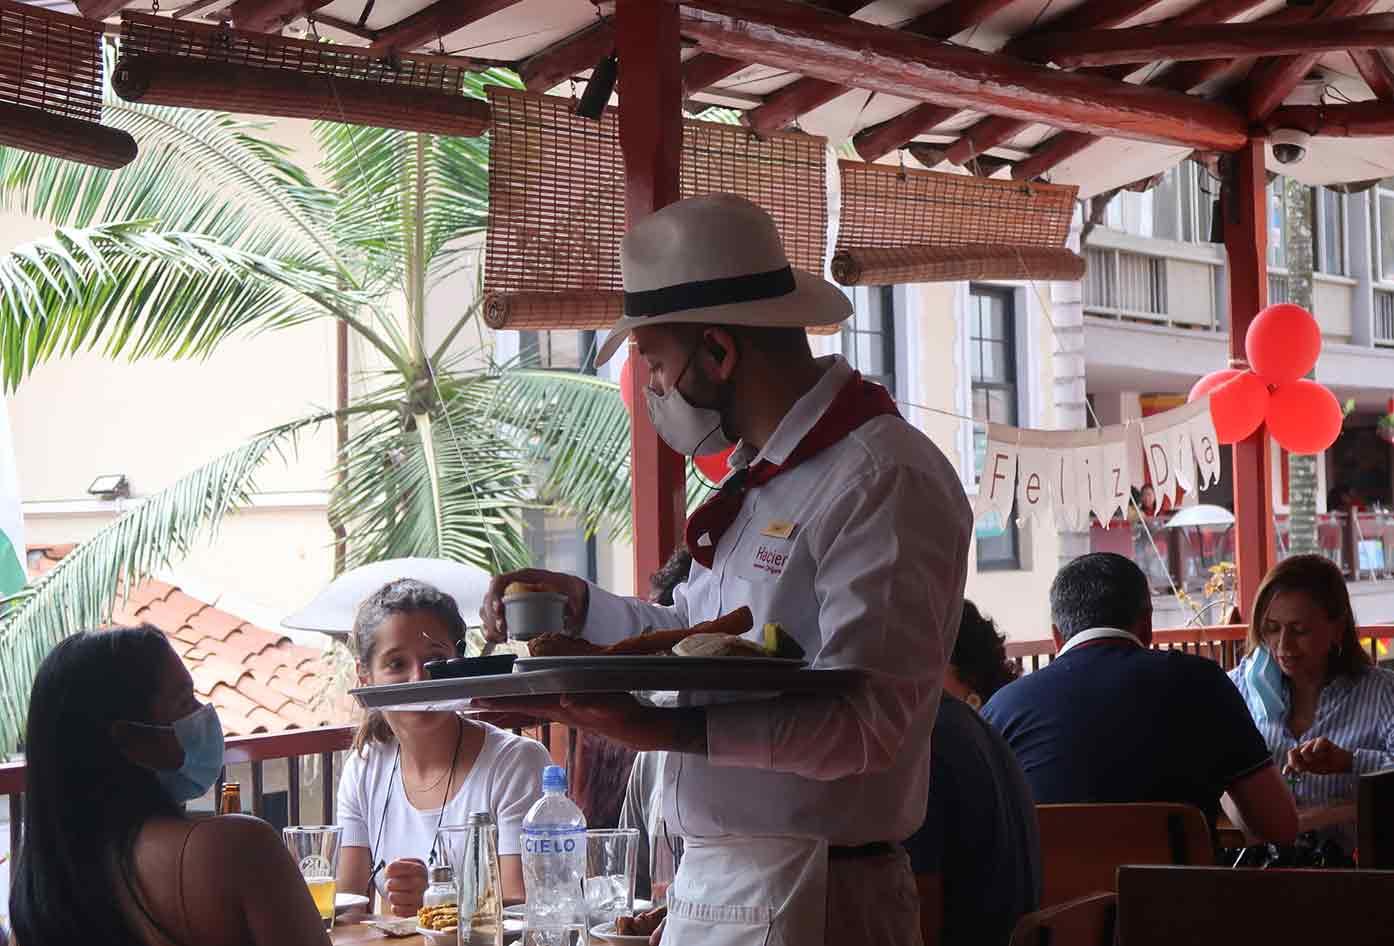 hacienda restaurant medellin